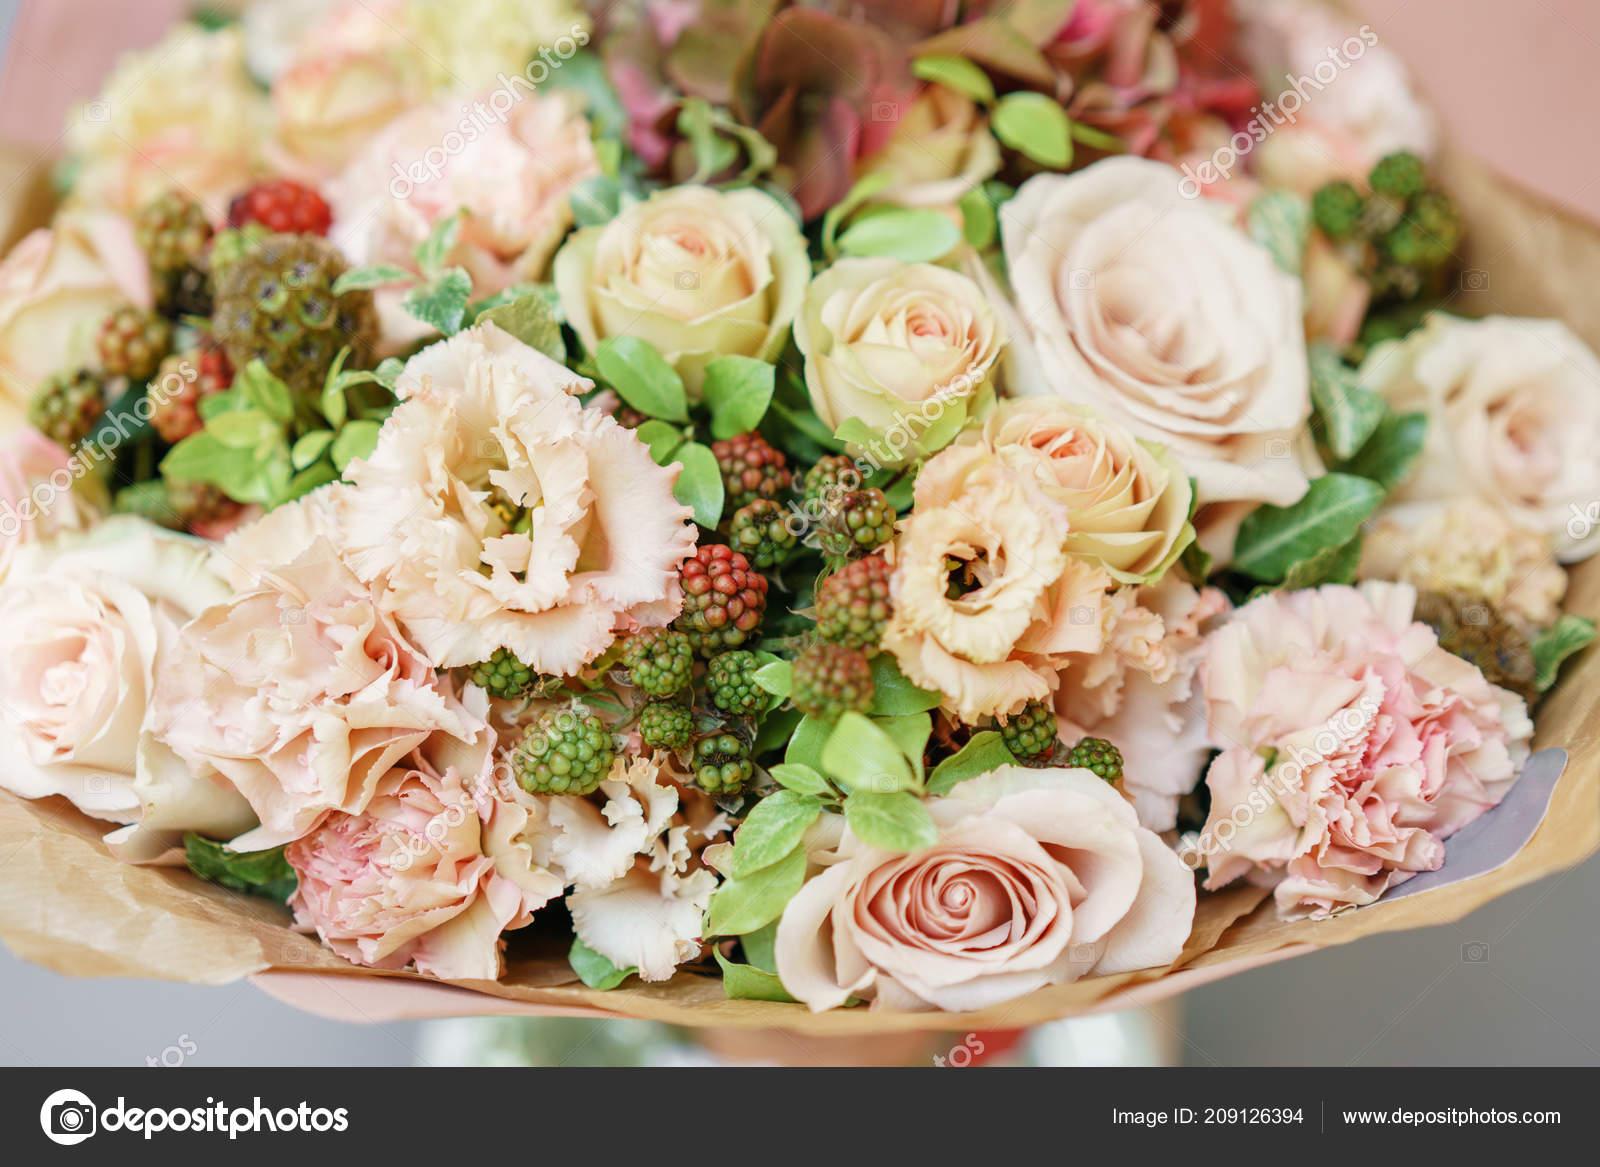 Arreglo Floral Mezcla De Flores Bouquet De Verano Hermoso